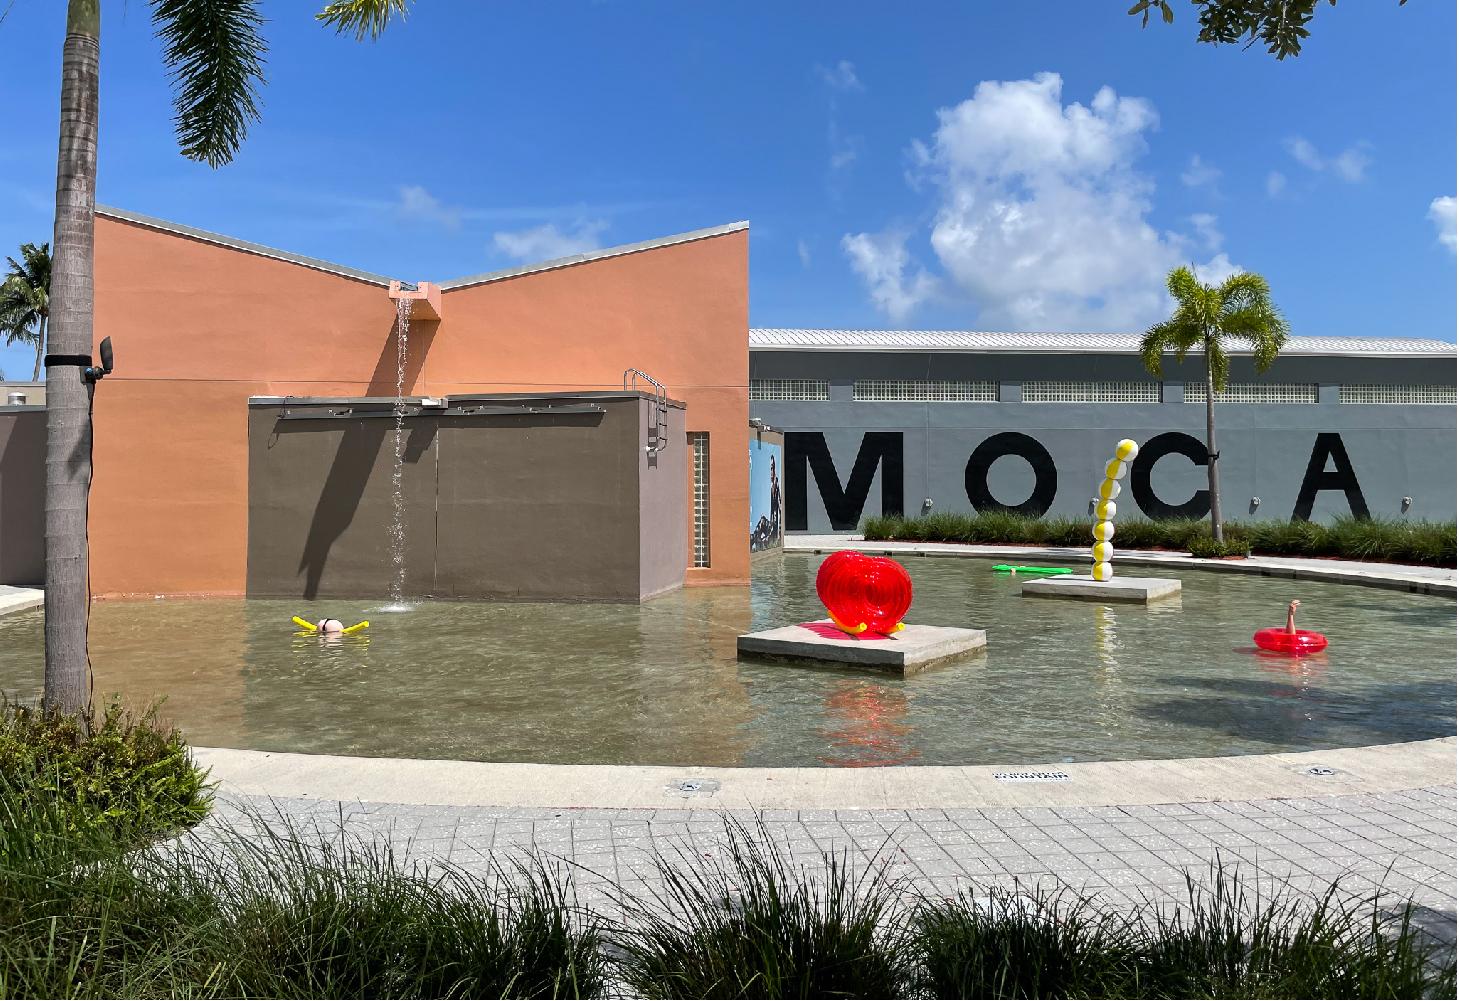 Art on the plaza: nice n' easy